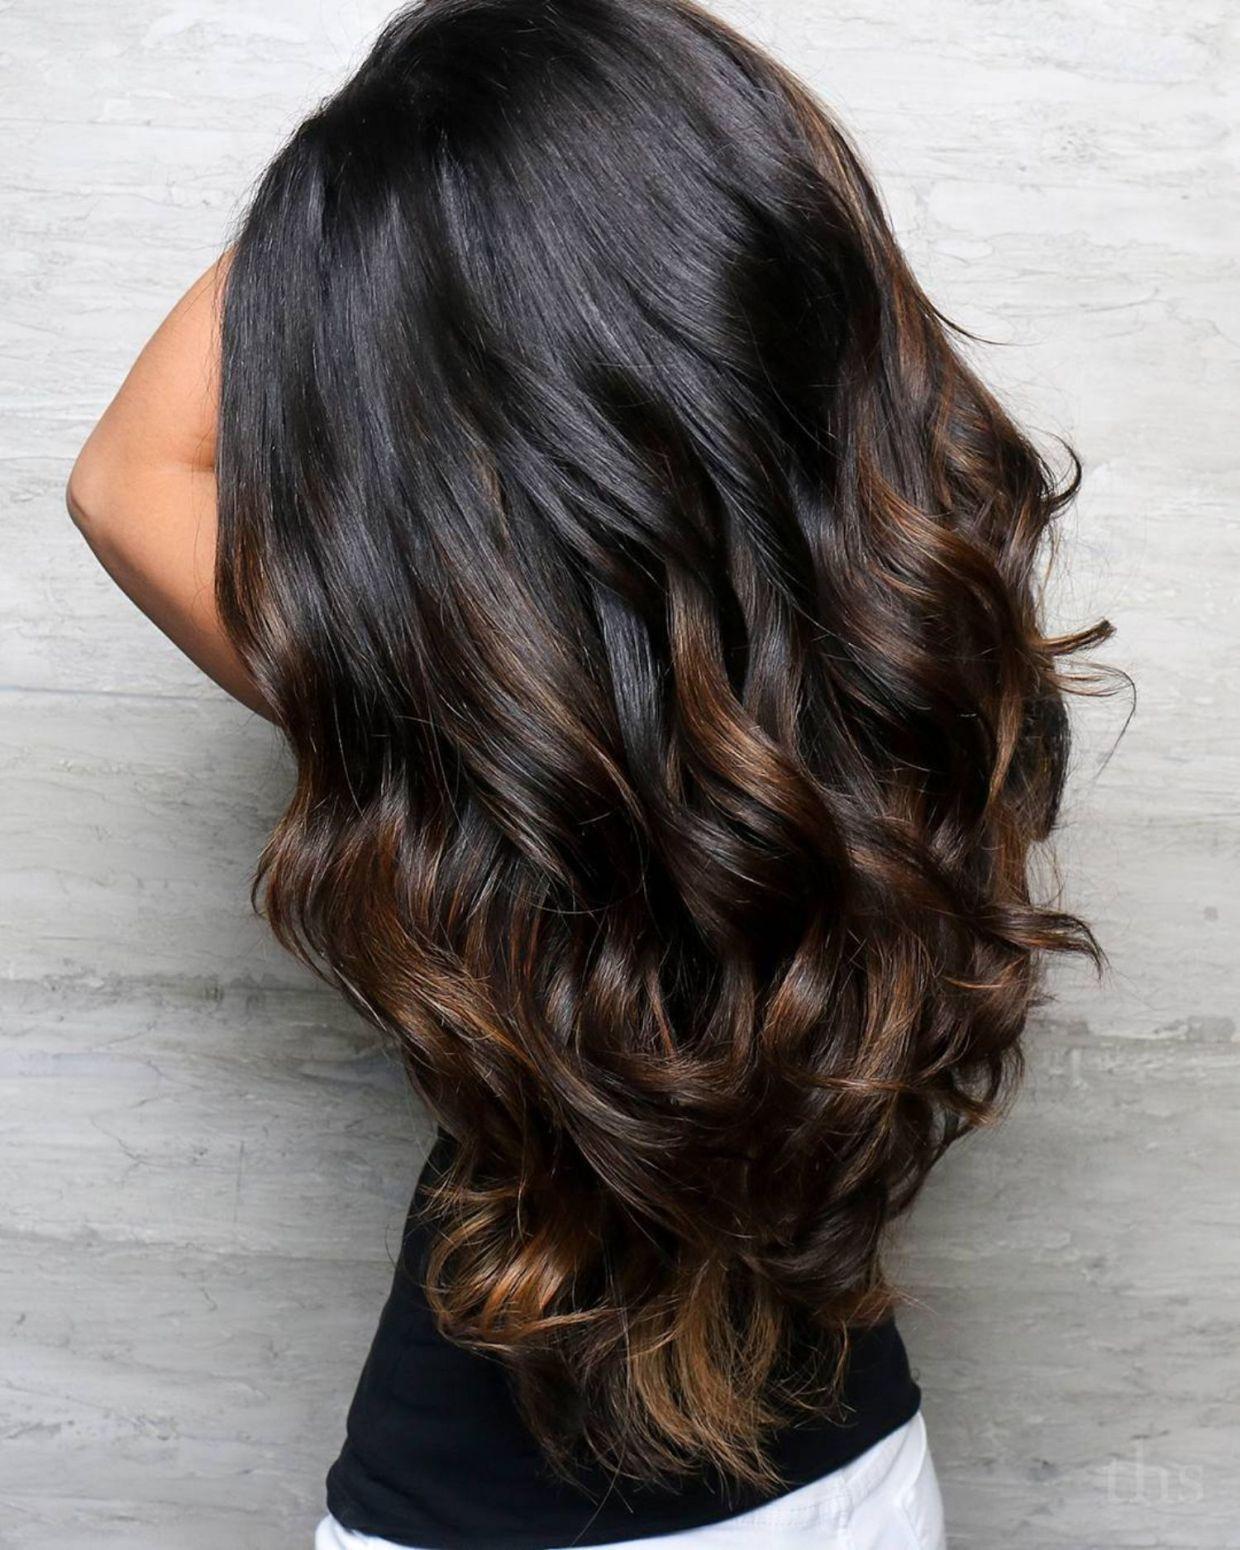 Long Dark Hair With Brown Highlights Balayage Hair Black Hair Balayage Balayage Hair Dark Black